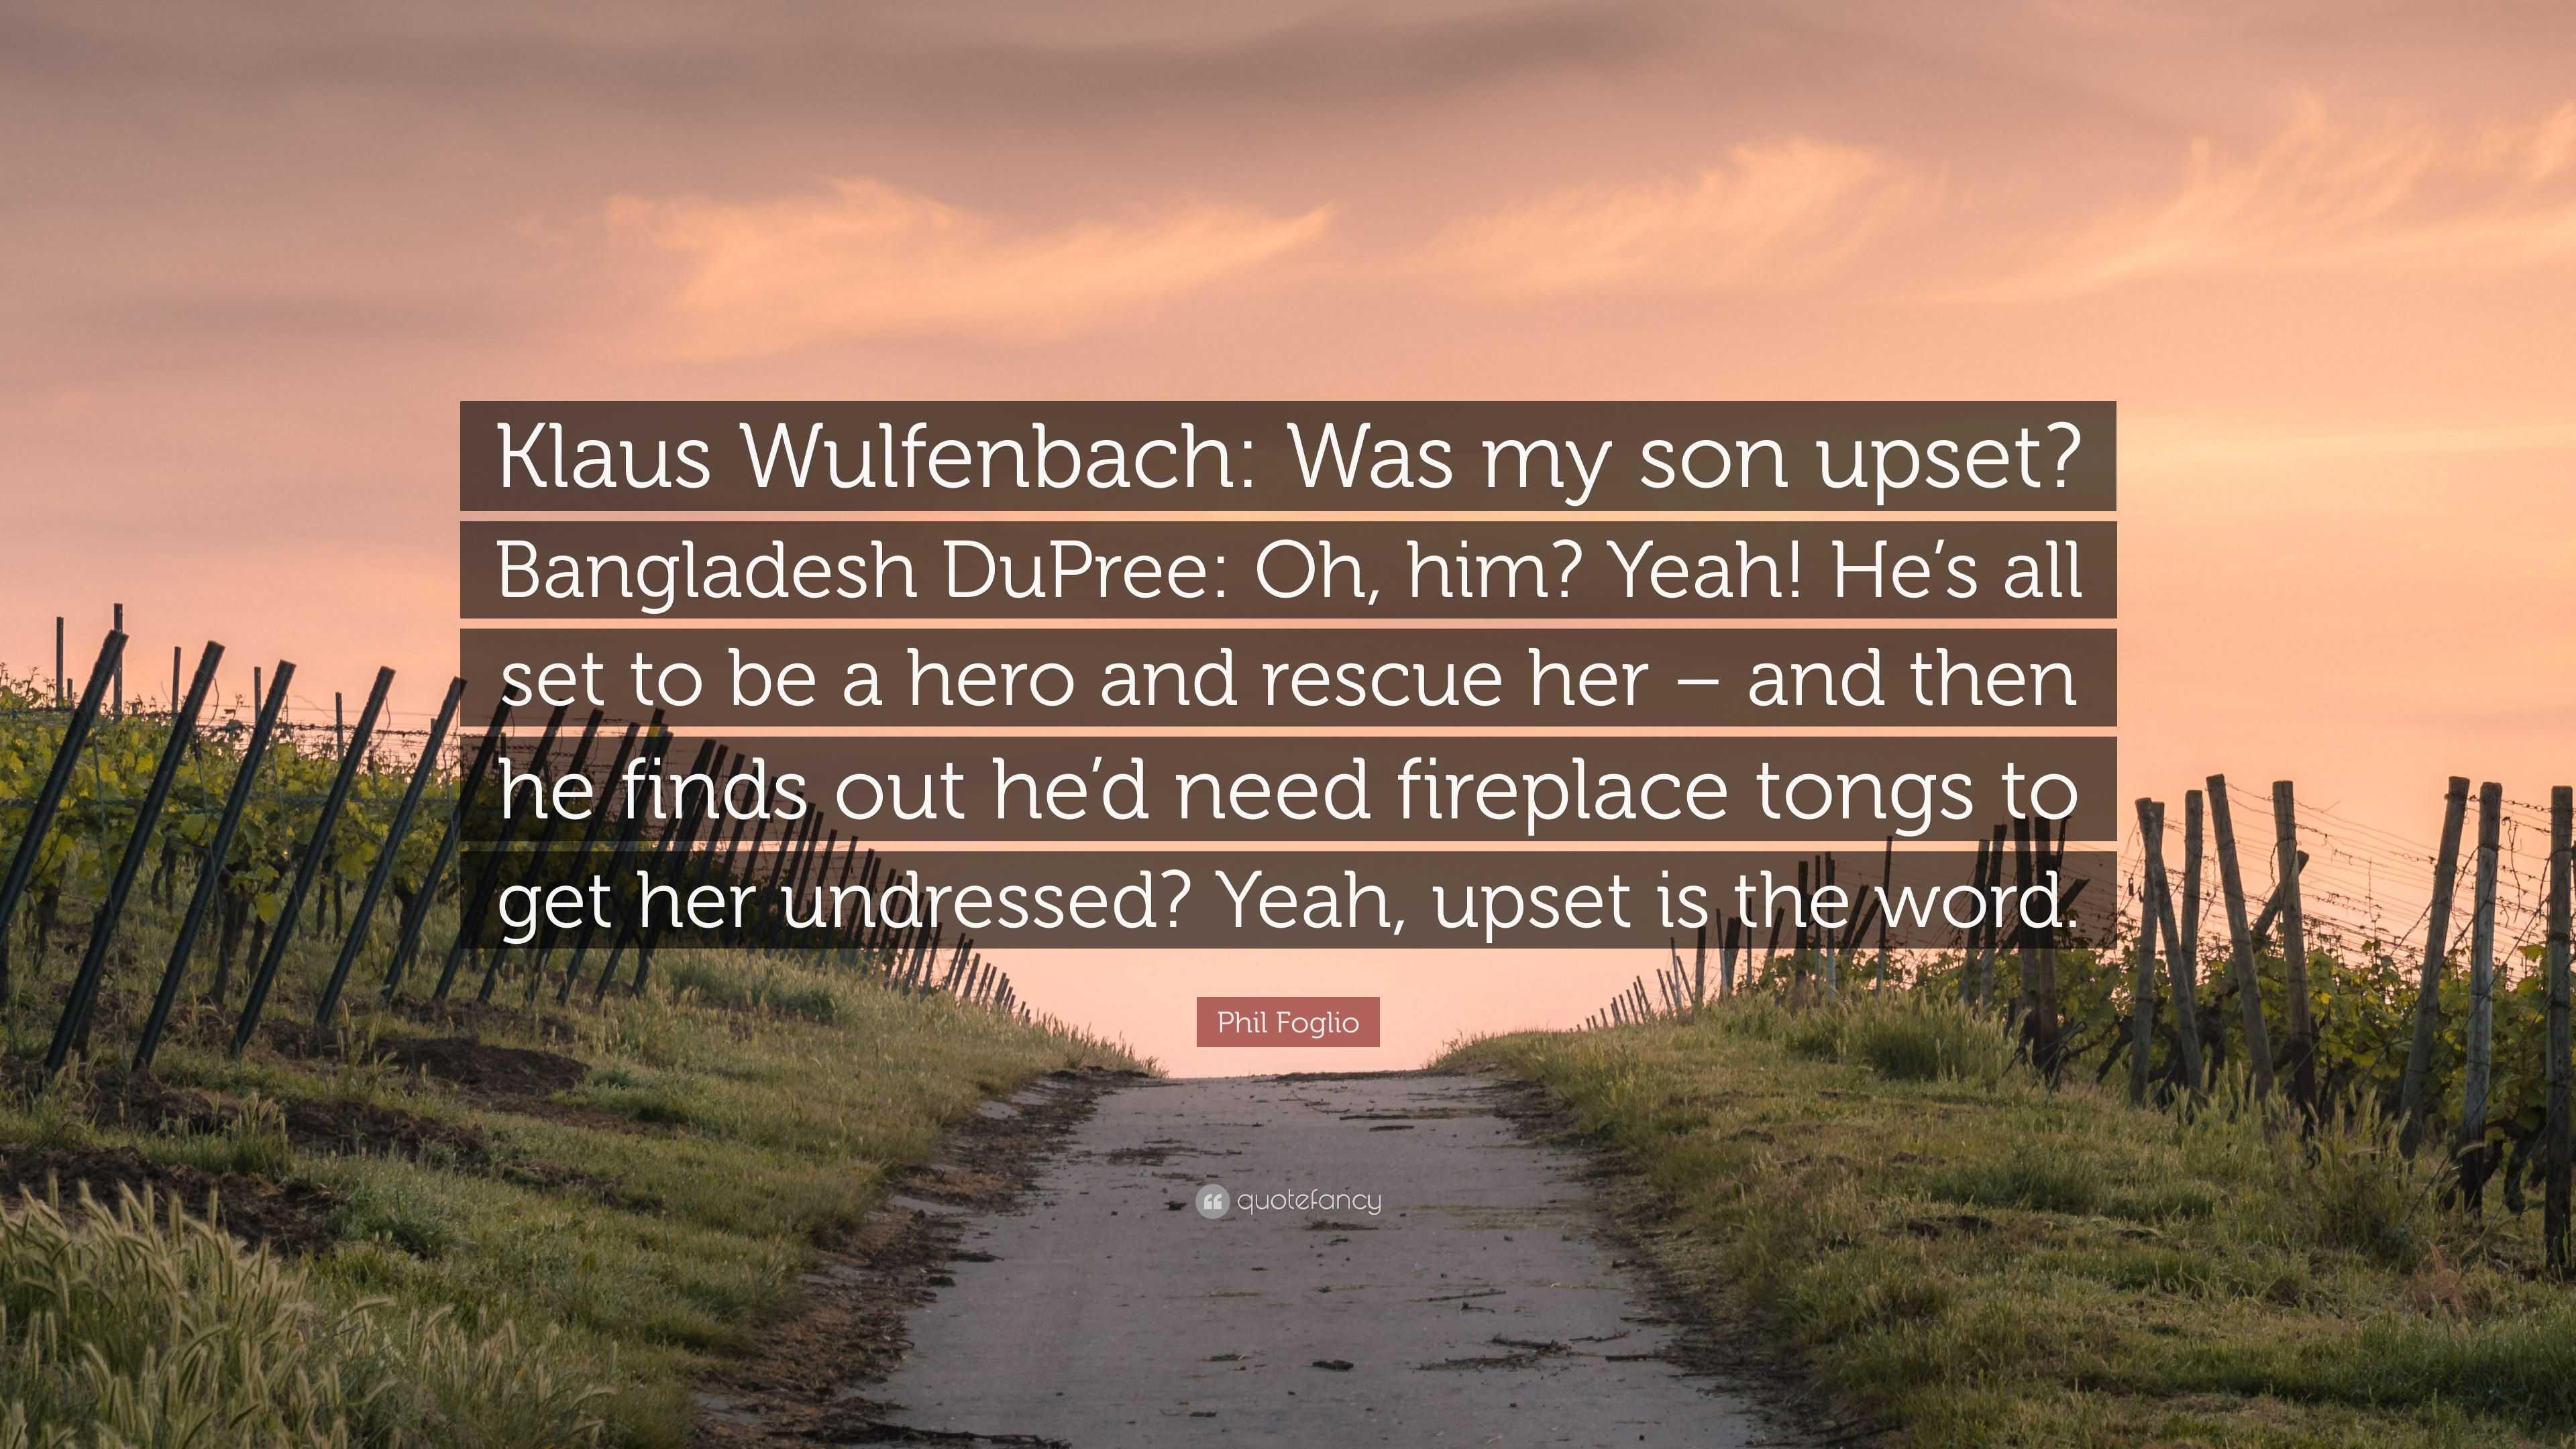 phil foglio quote u201cklaus wulfenbach was my son upset bangladesh